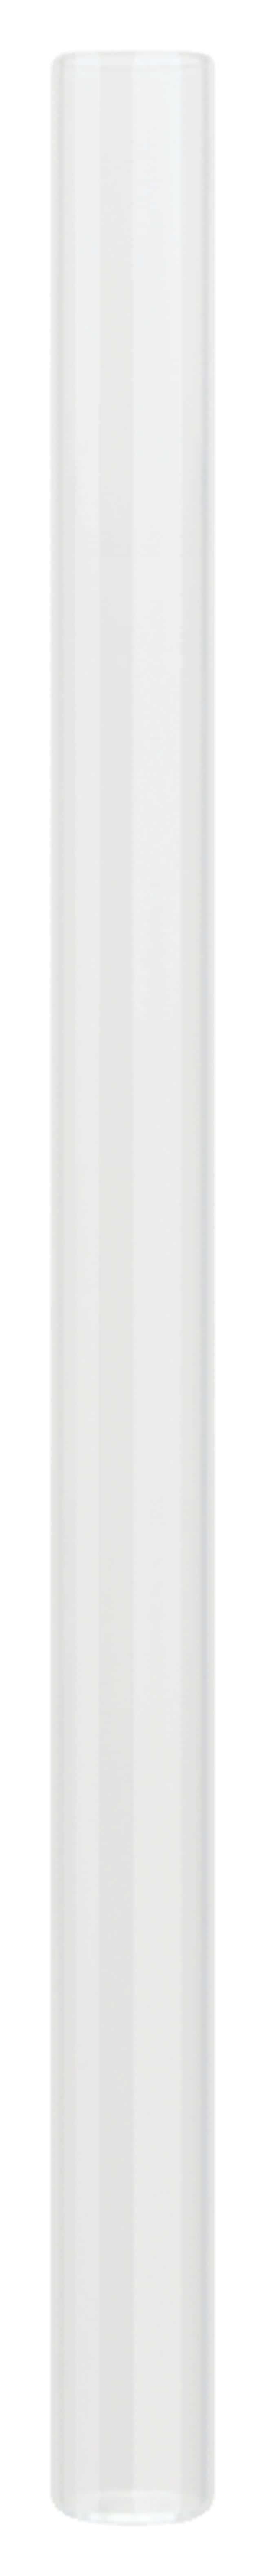 DWK Life Sciences Kimble Kontes Brand 5mm Disposable Grade NMR Sample Tubes